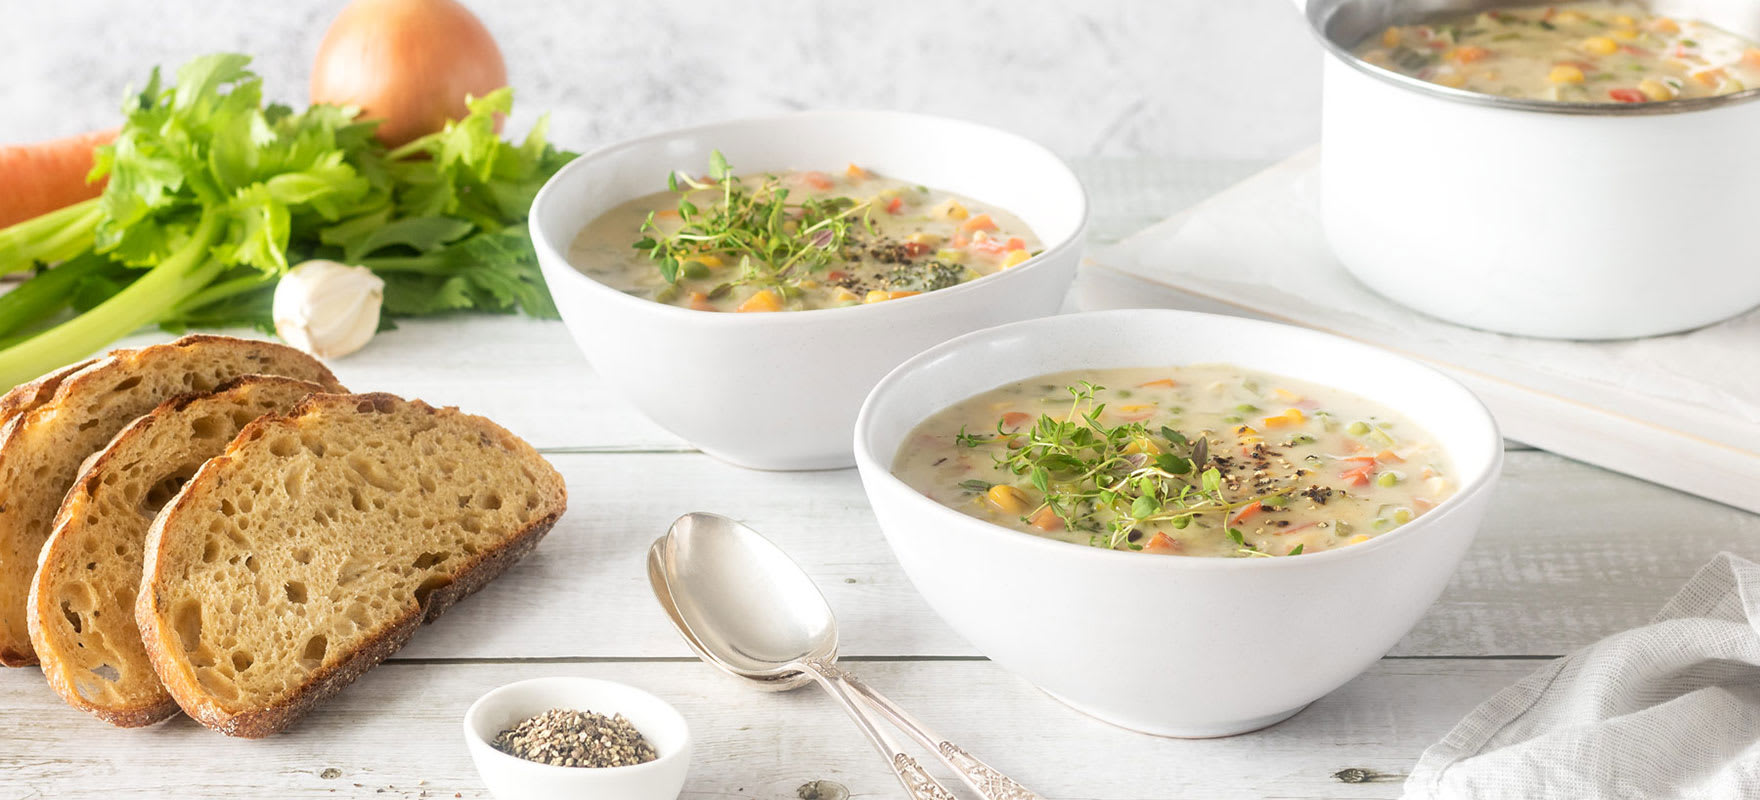 Creamy vegetable soup image 1